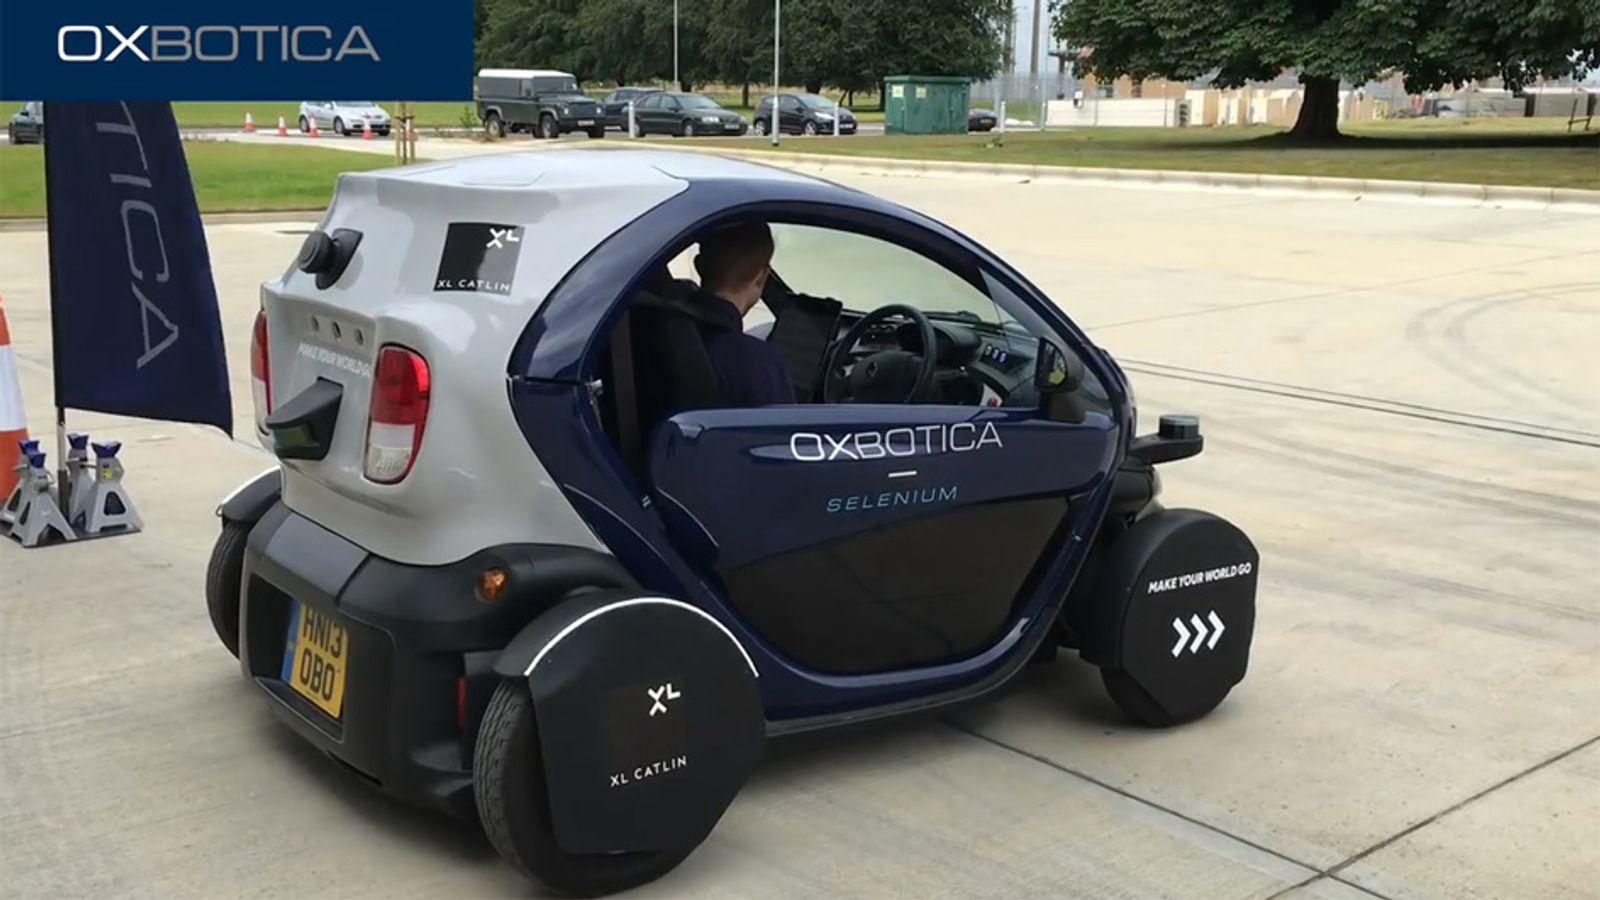 Public Trial For Driverless Cars Beginning In Milton Keynes